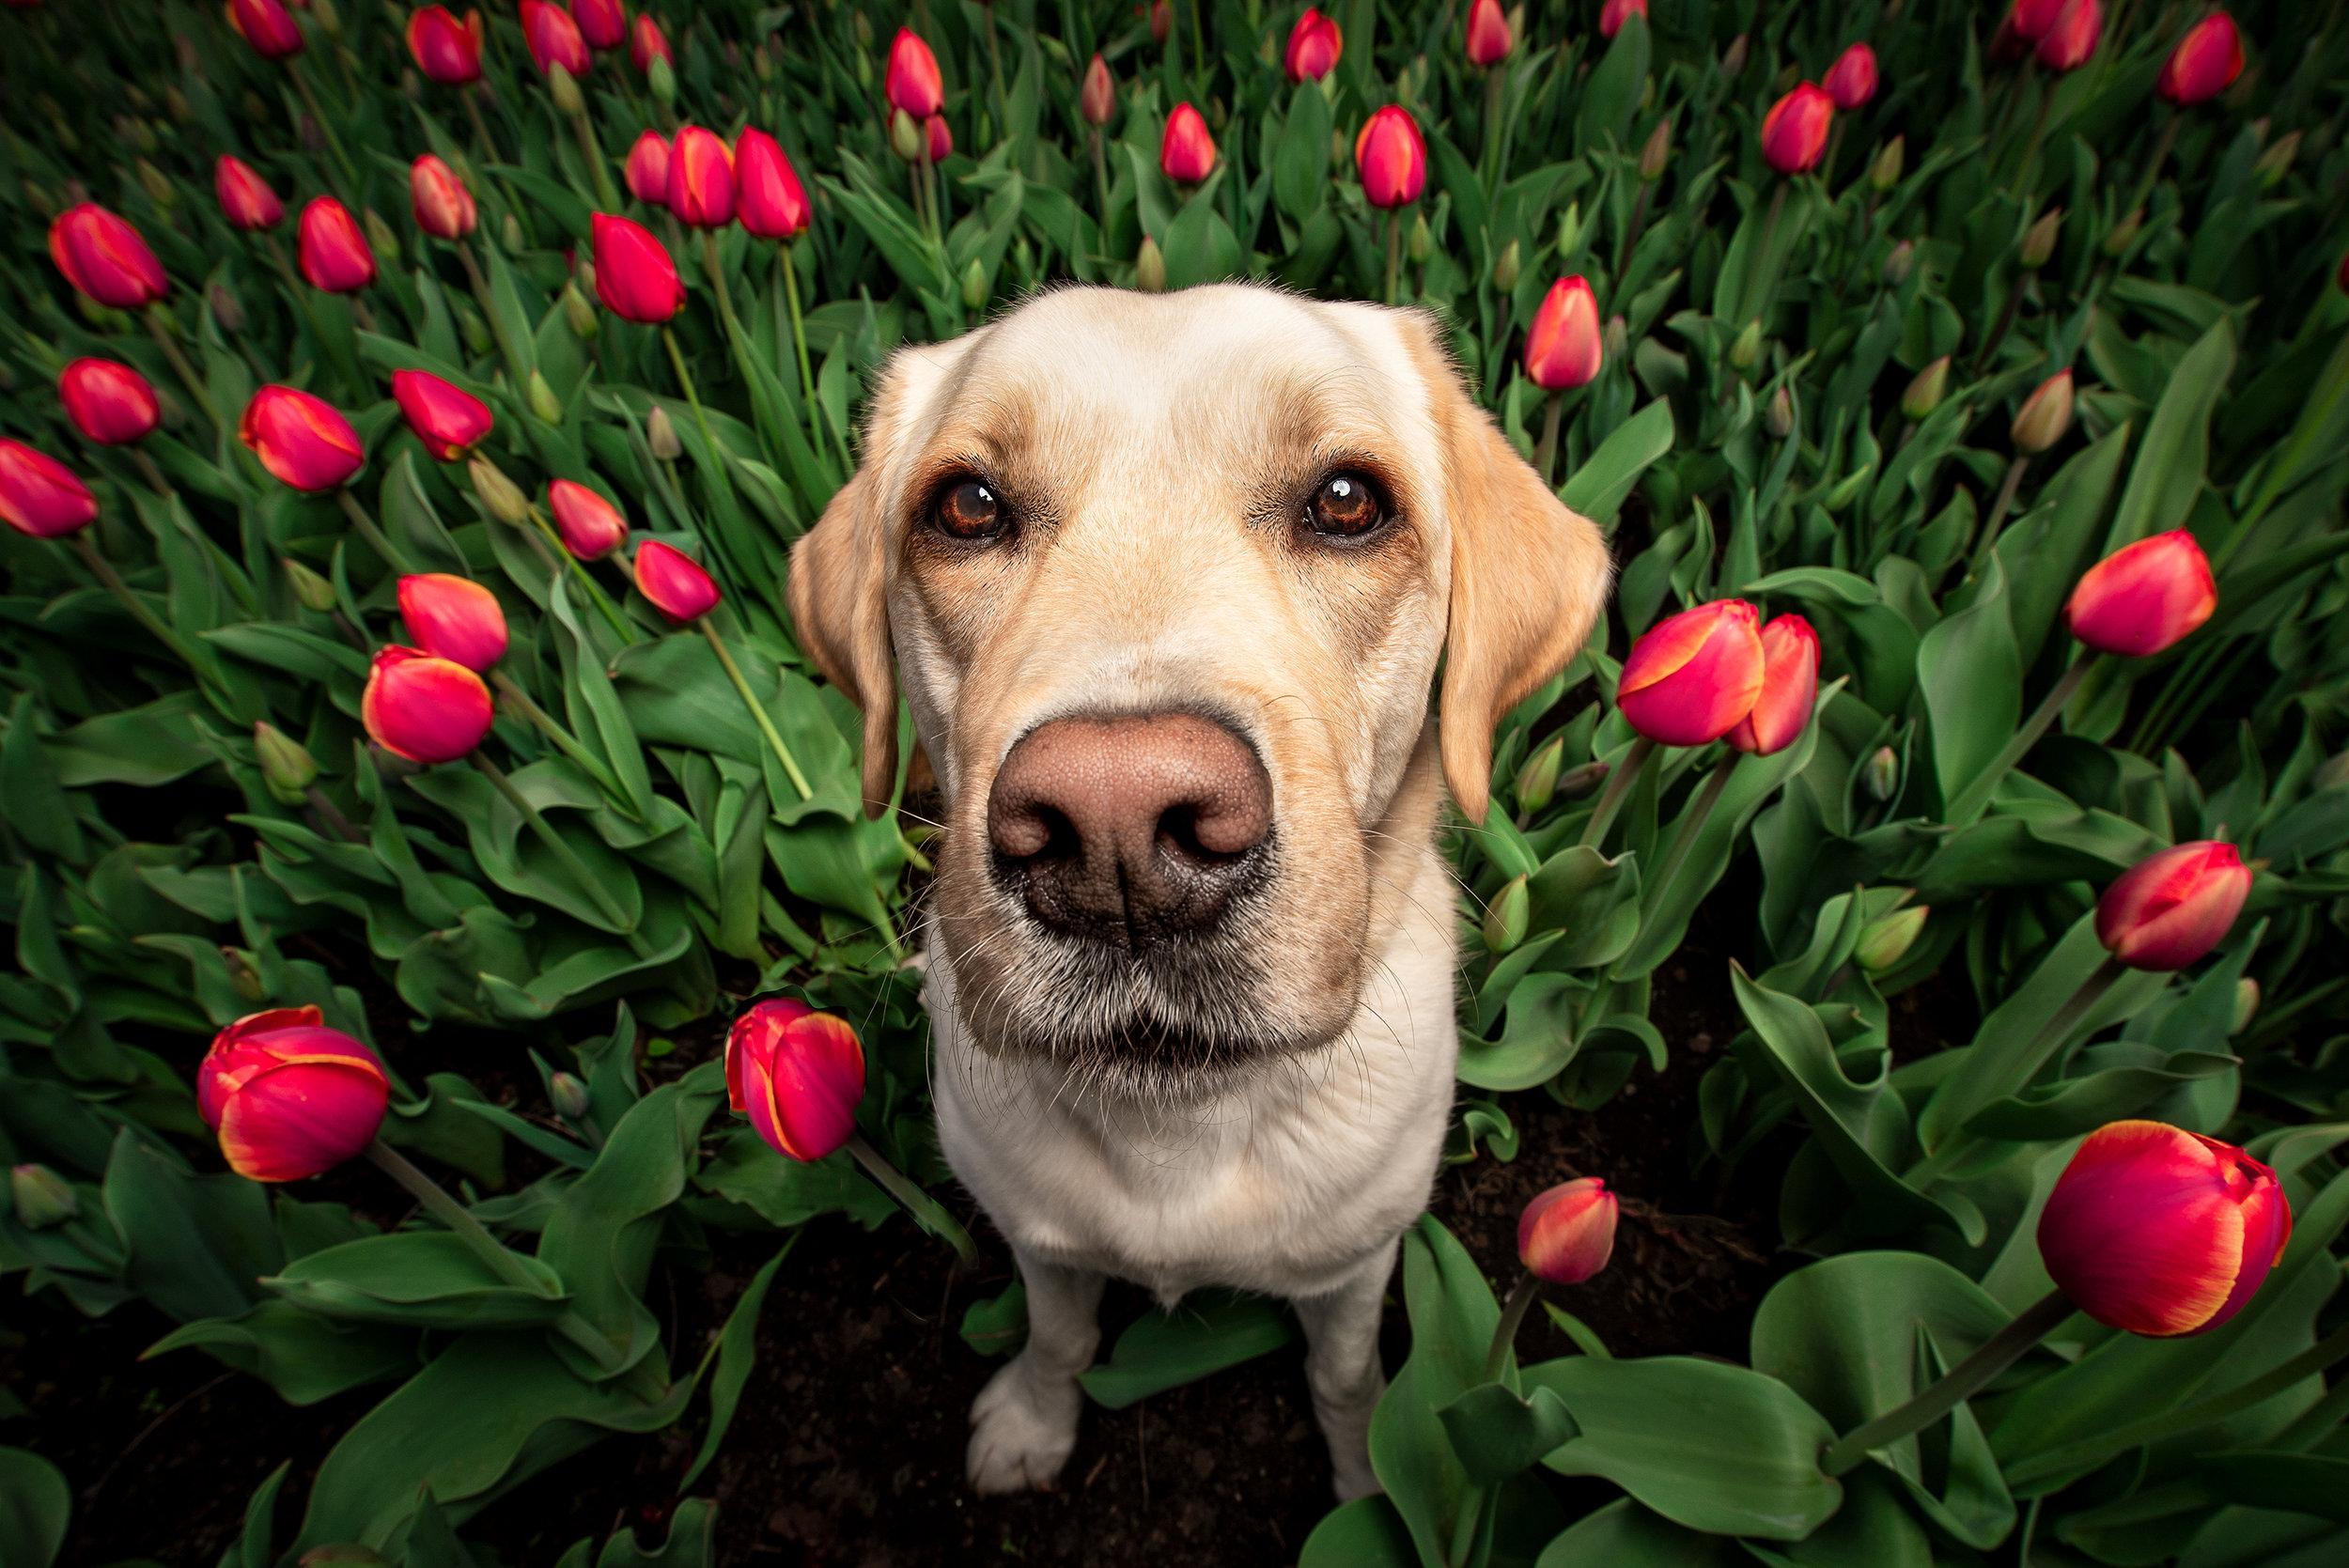 Pet photographer Ottawa - Ottawa photographer - Ottawa dog photographer - animal photographer - salt photography - dog photographer canada - Yellow labrador retriever - tulips and dogs.jpg